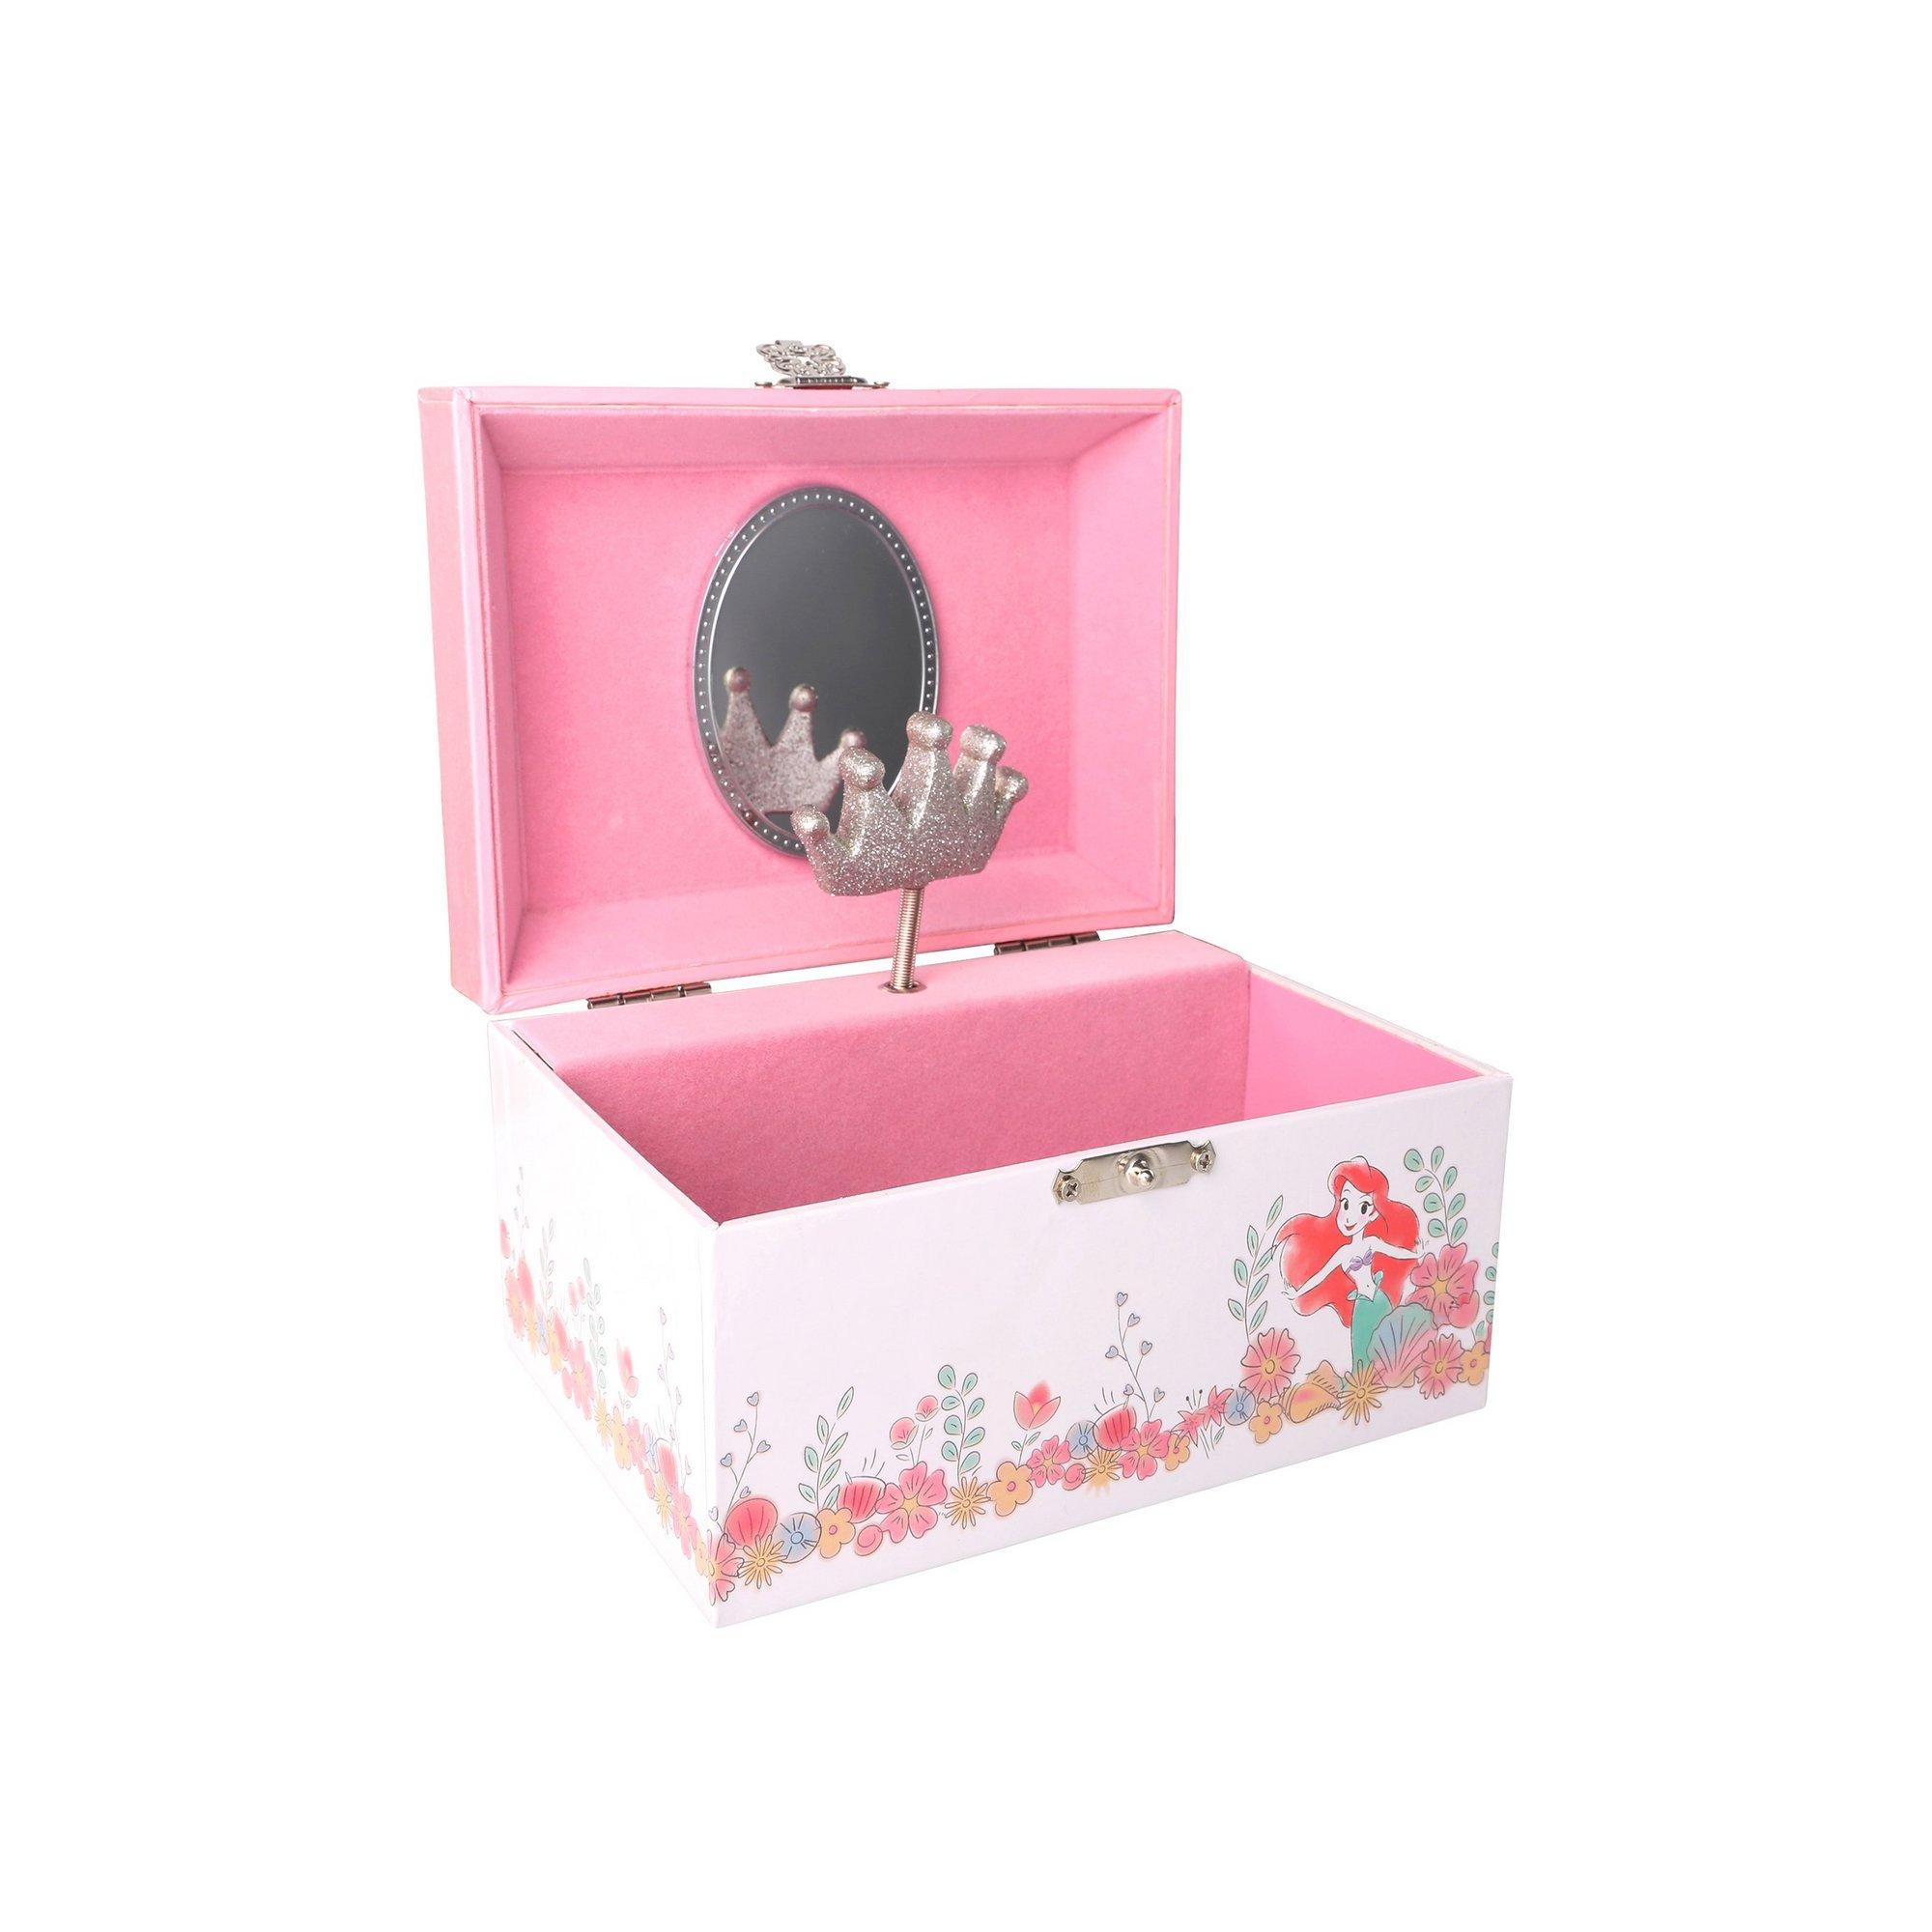 Image of Disney Princess Jewellery Box